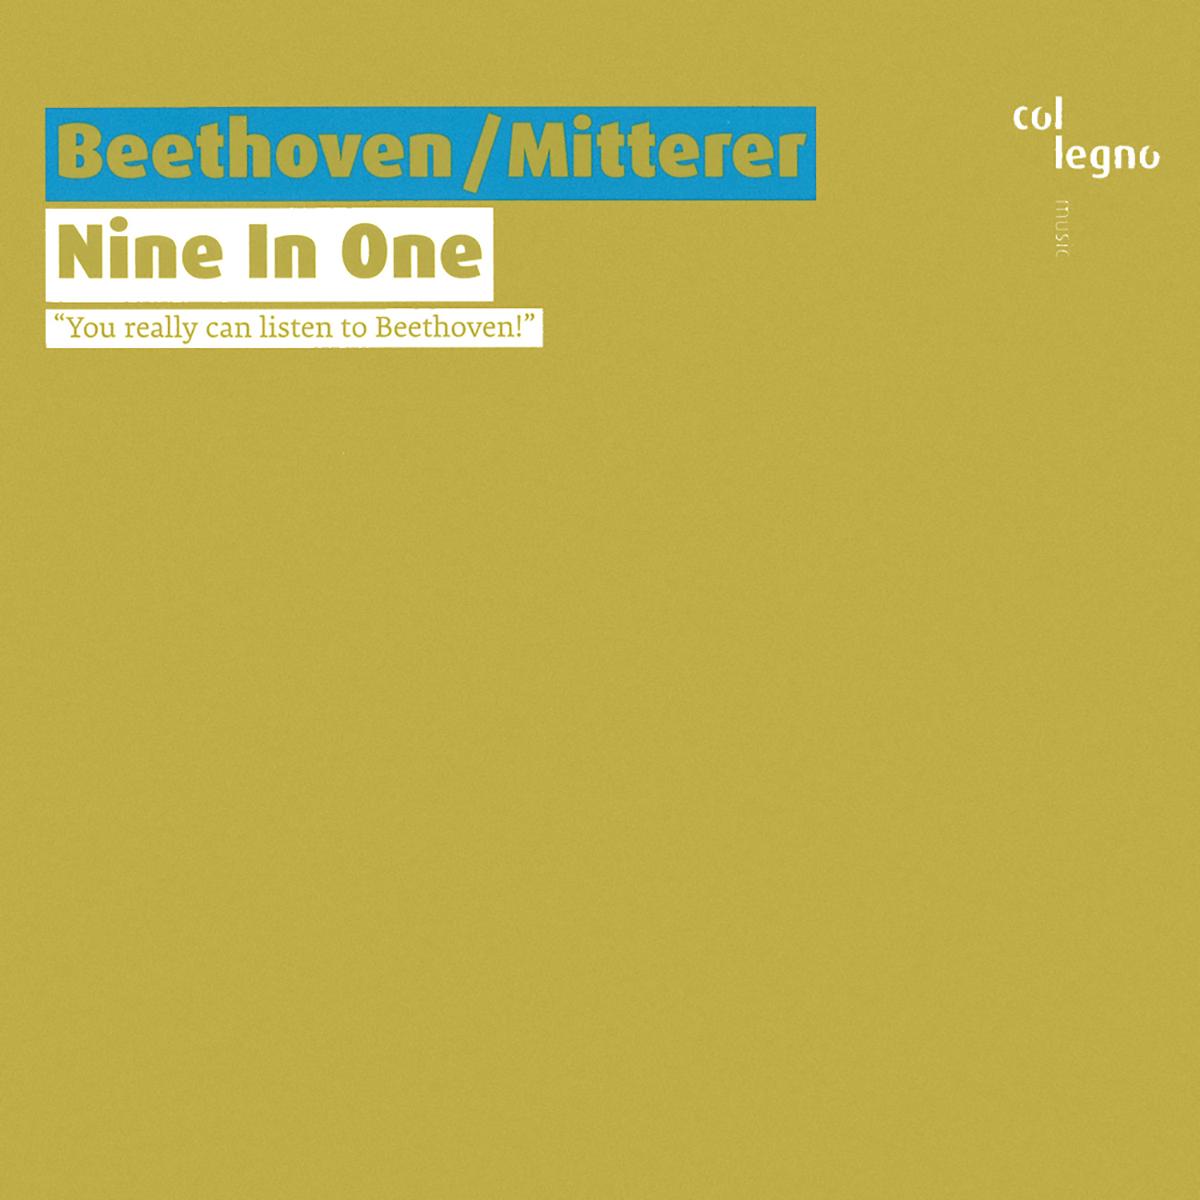 Beethoven Mitterer - Nine in one